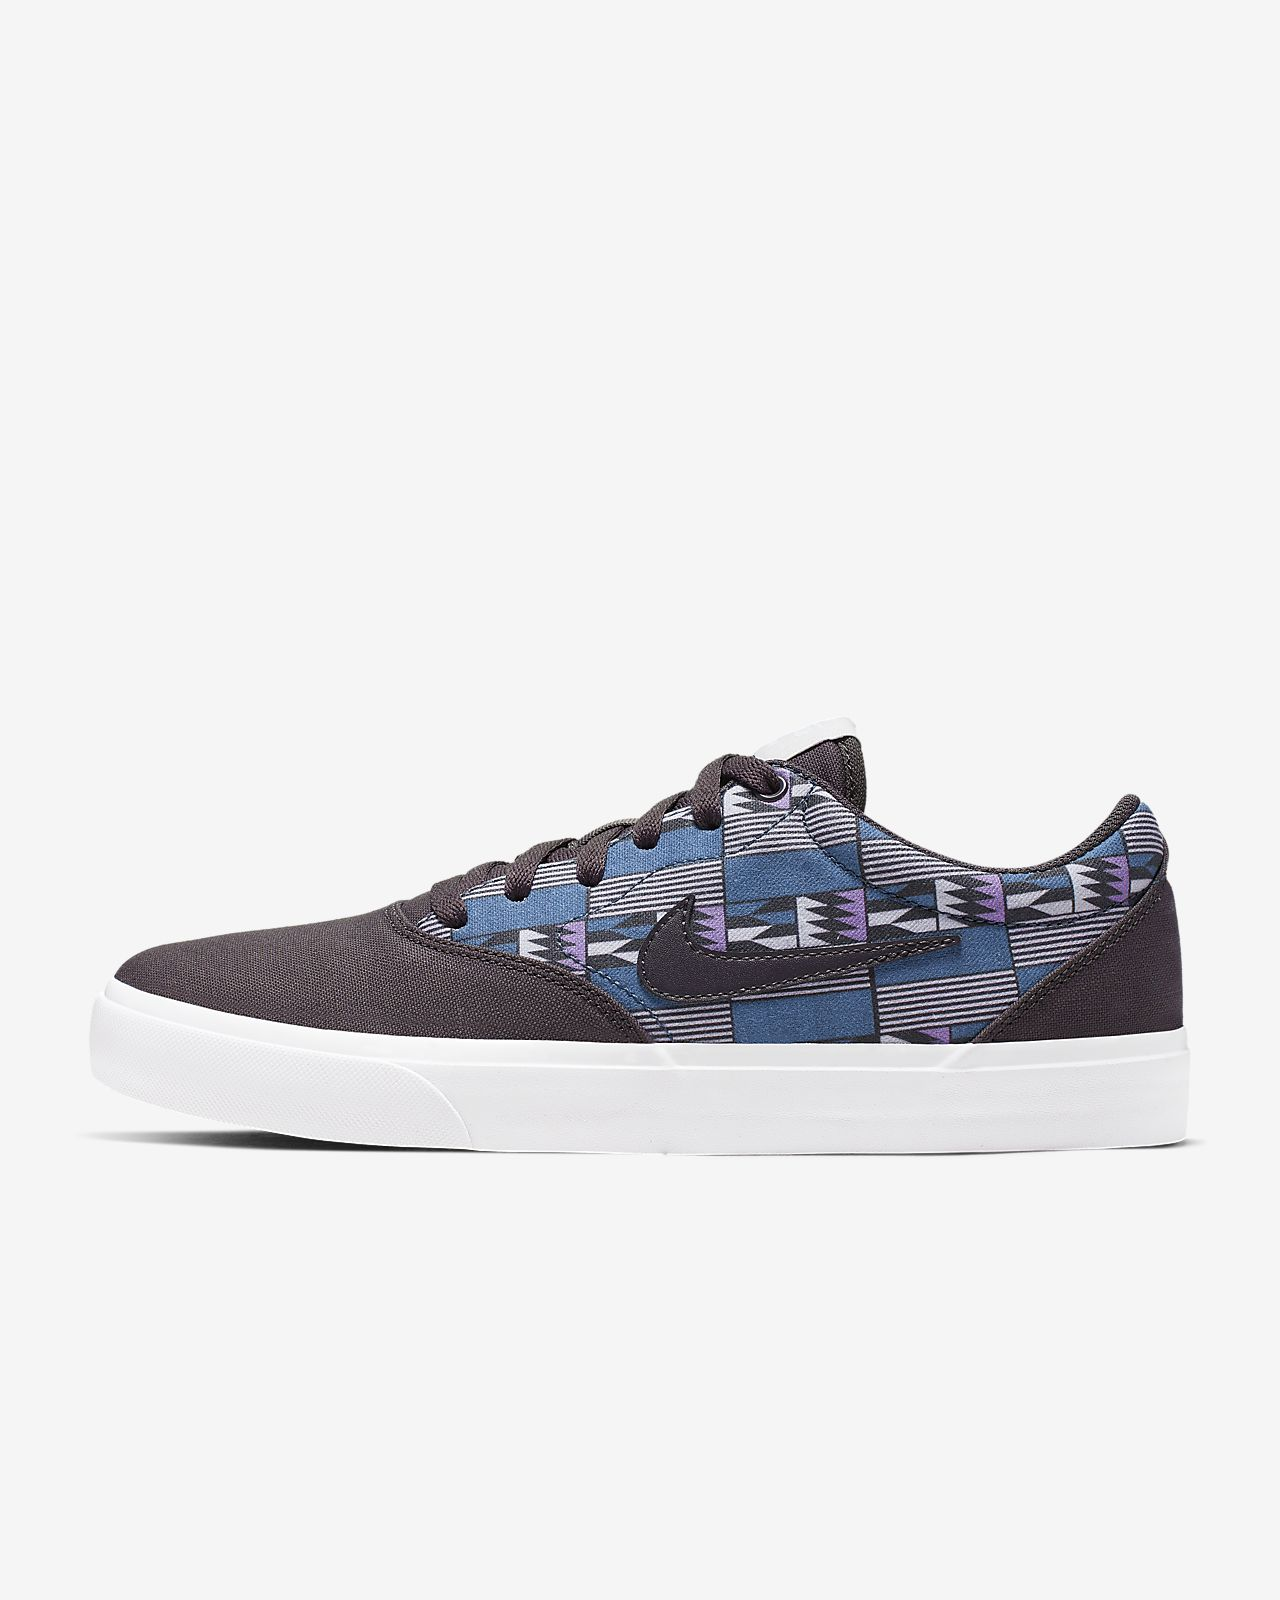 Sapatilhas de skateboard Nike SB Charge Premium